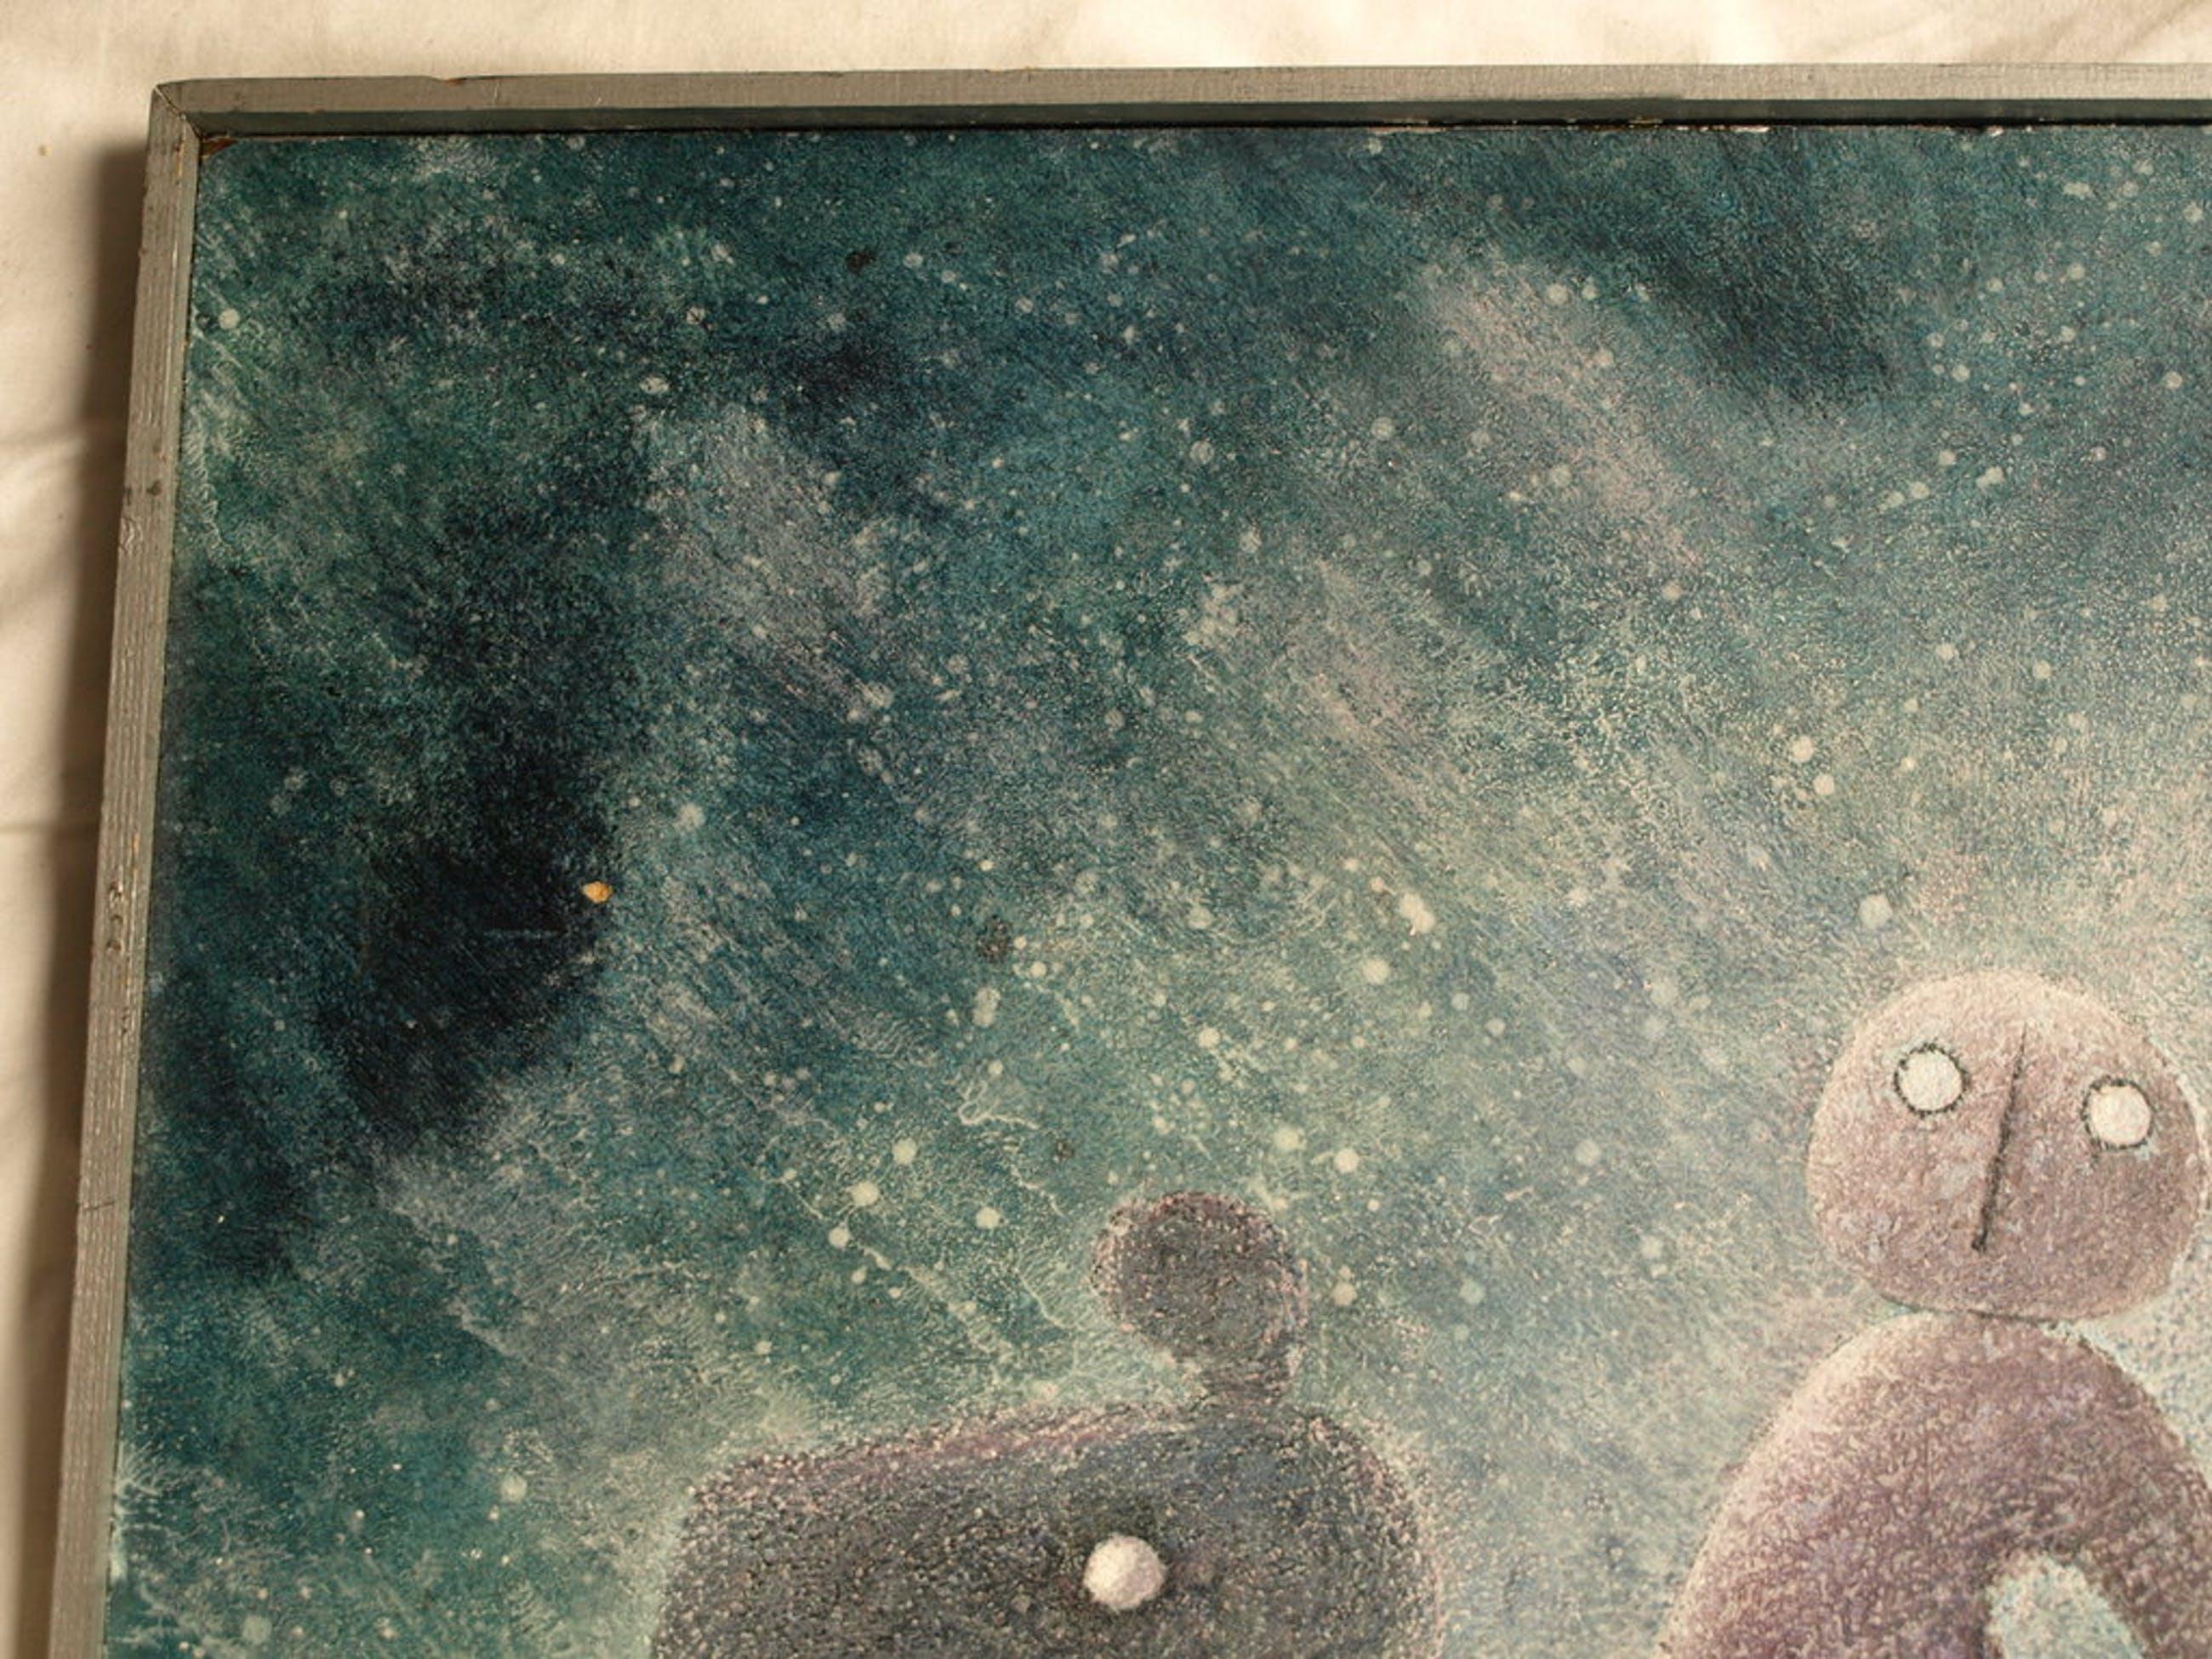 Huub Slabbers (1910-2002) : Acryl op spaanplaat – Yessna – gesigneerd - 1975 kopen? Bied vanaf 1!